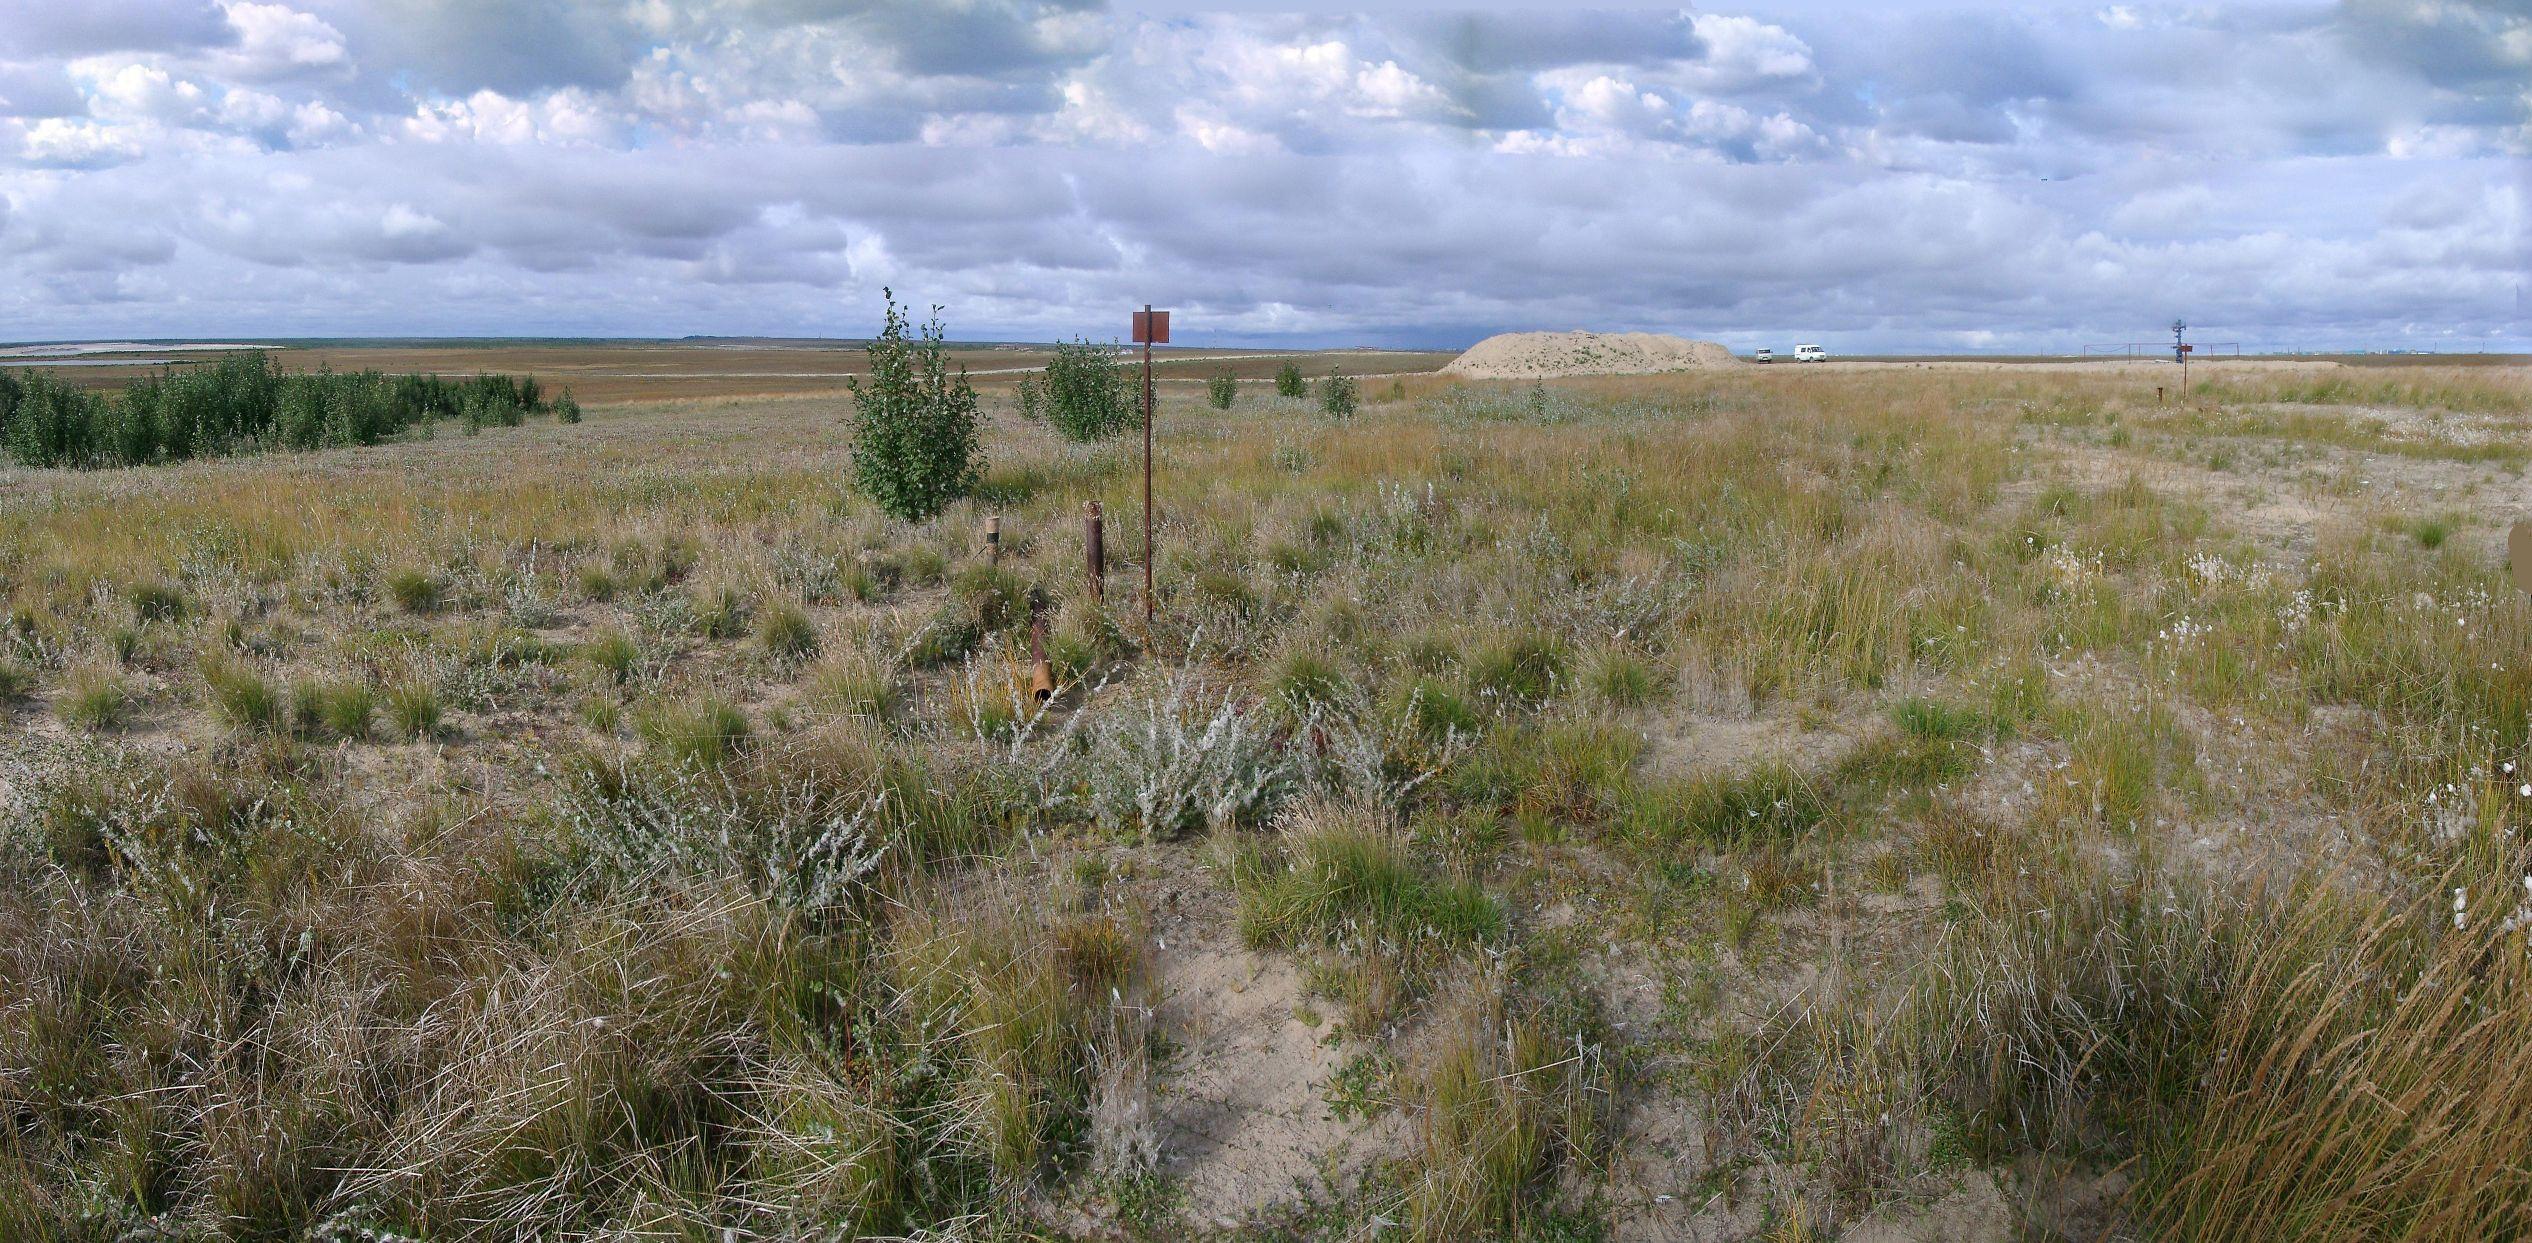 soil temperature observations in tundra (Taz peninsula)